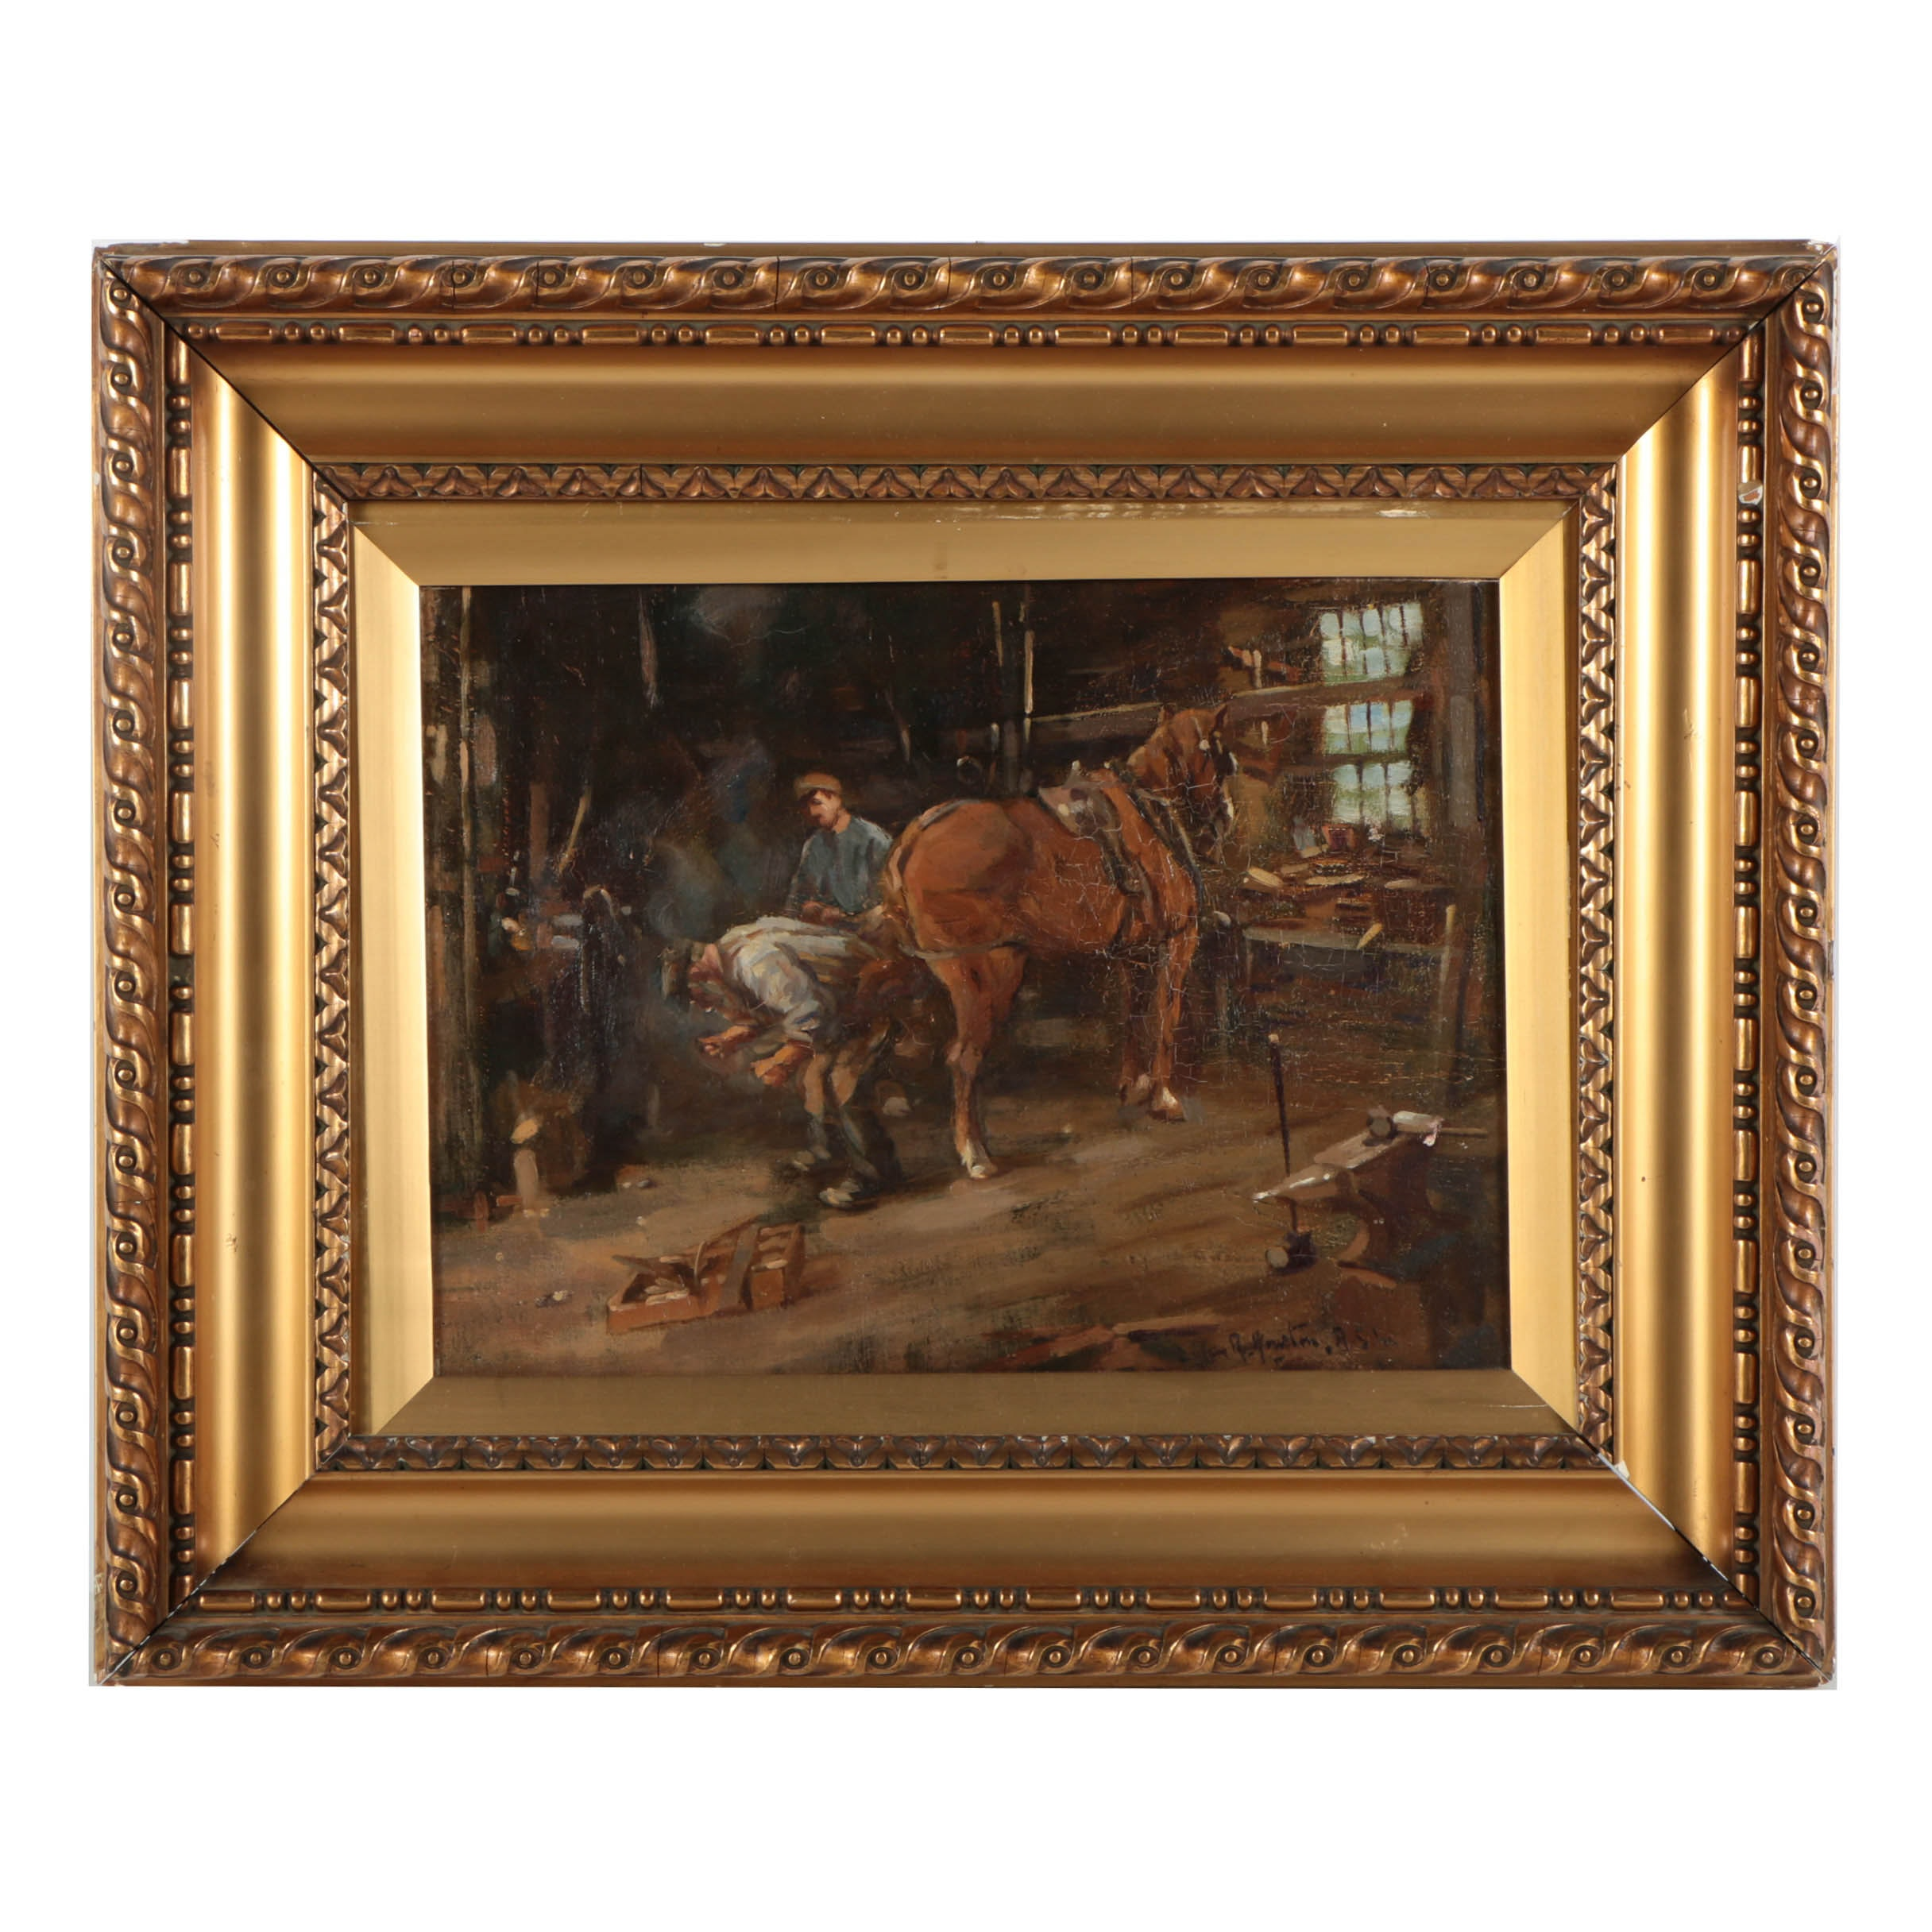 "John Rennie McKenzie Houston Oil Painting on Canvas ""The Blacksmith Shop"""